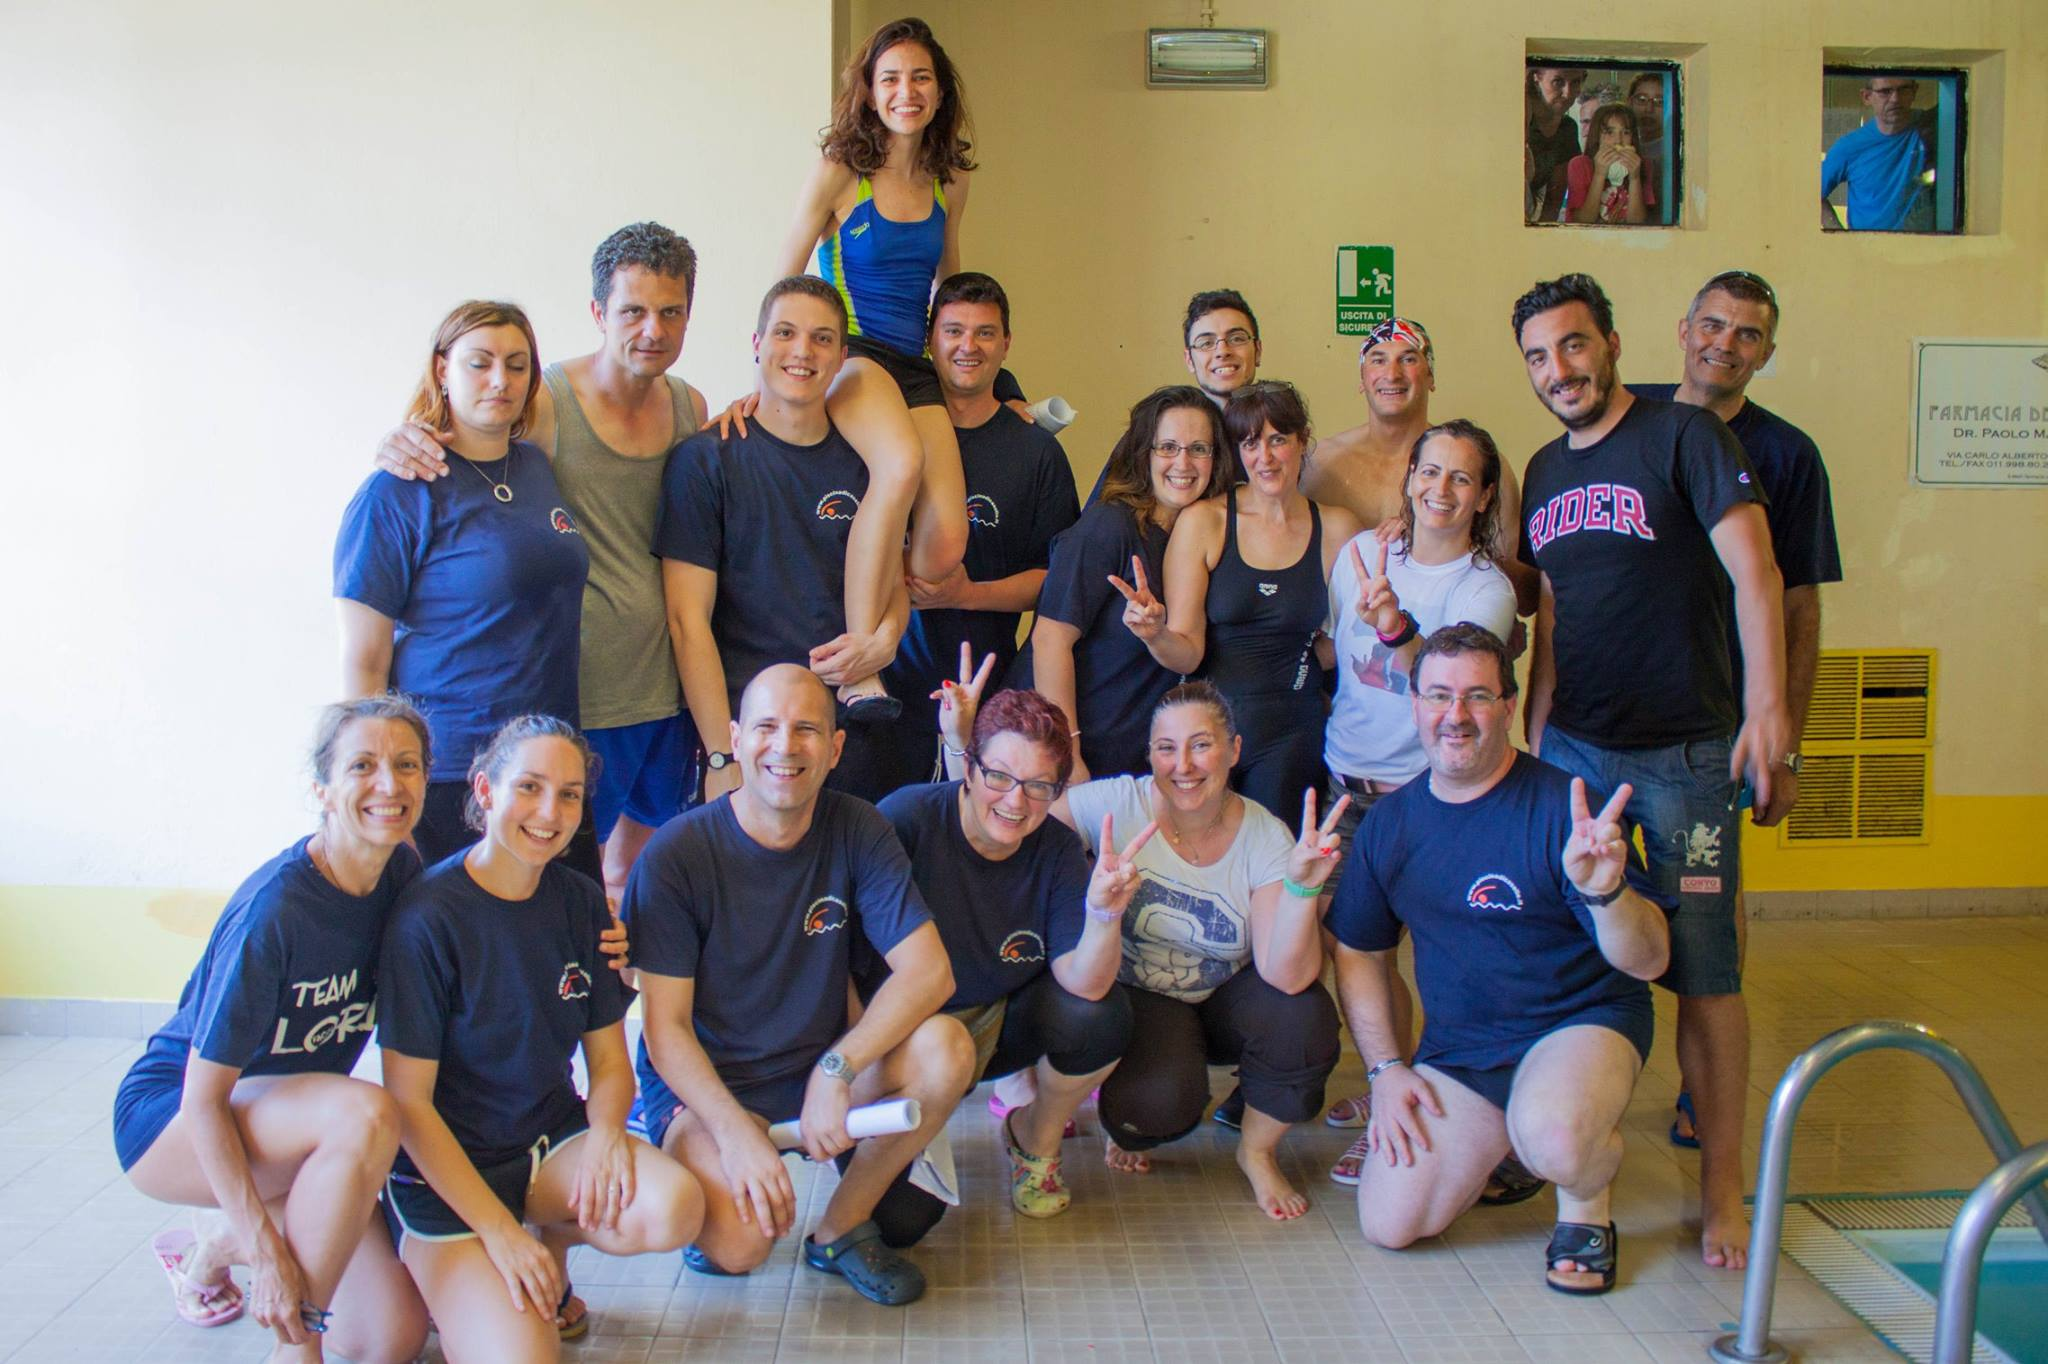 News 2015 Piscina Comunale Di Caselle Torinese